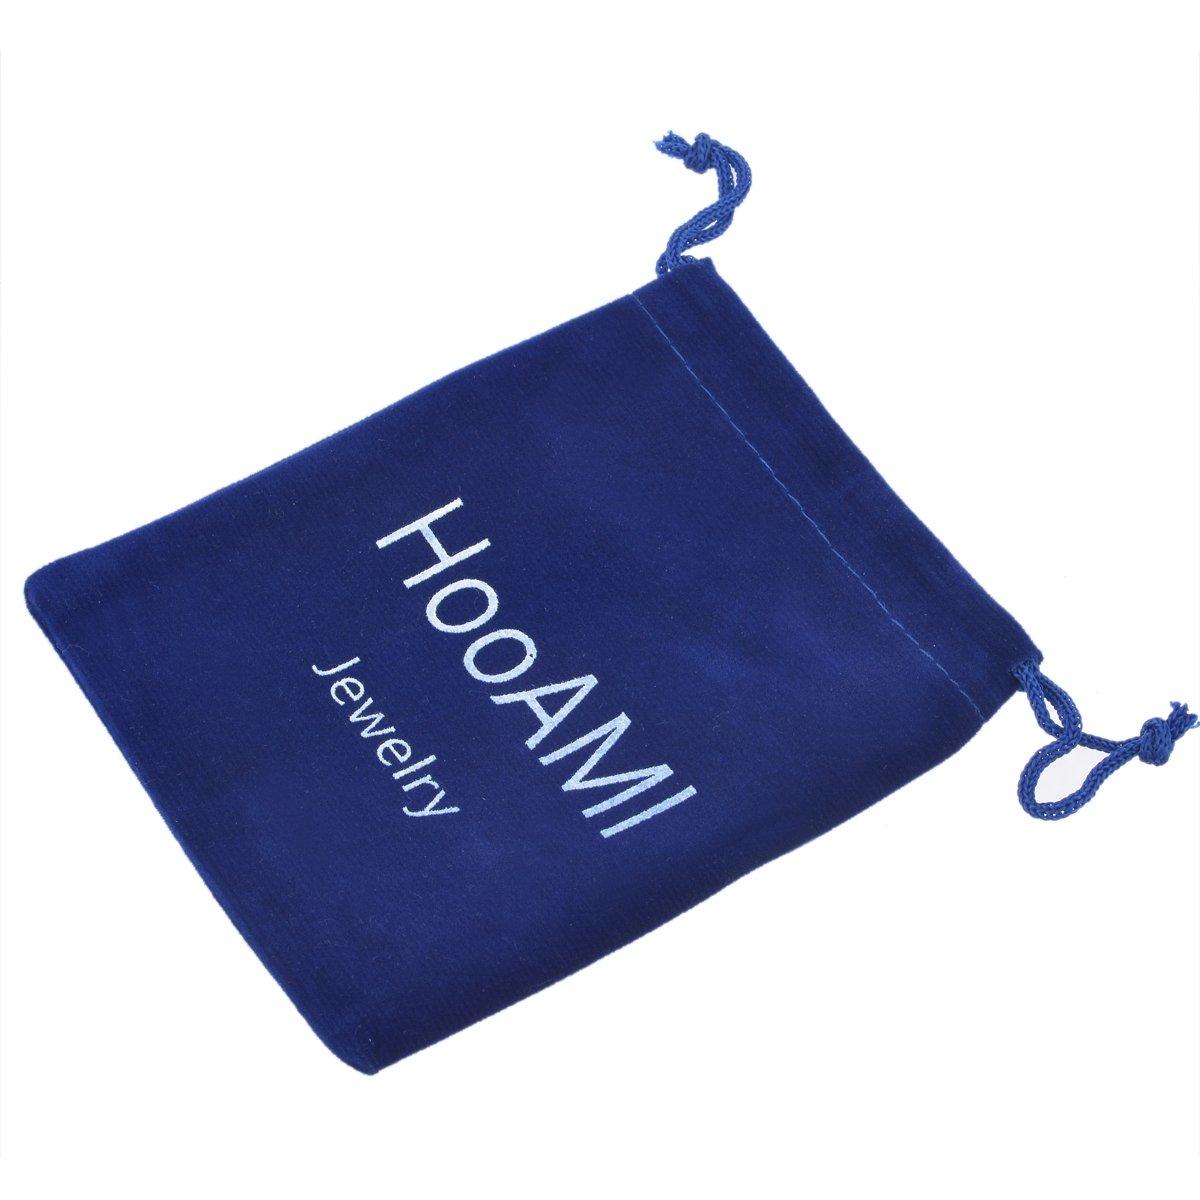 HooAMI Mens Fashion Metal Simple Necktie Tie Bar Clip 2 3/8'' Inch, Gold Plated by HooAMI (Image #4)